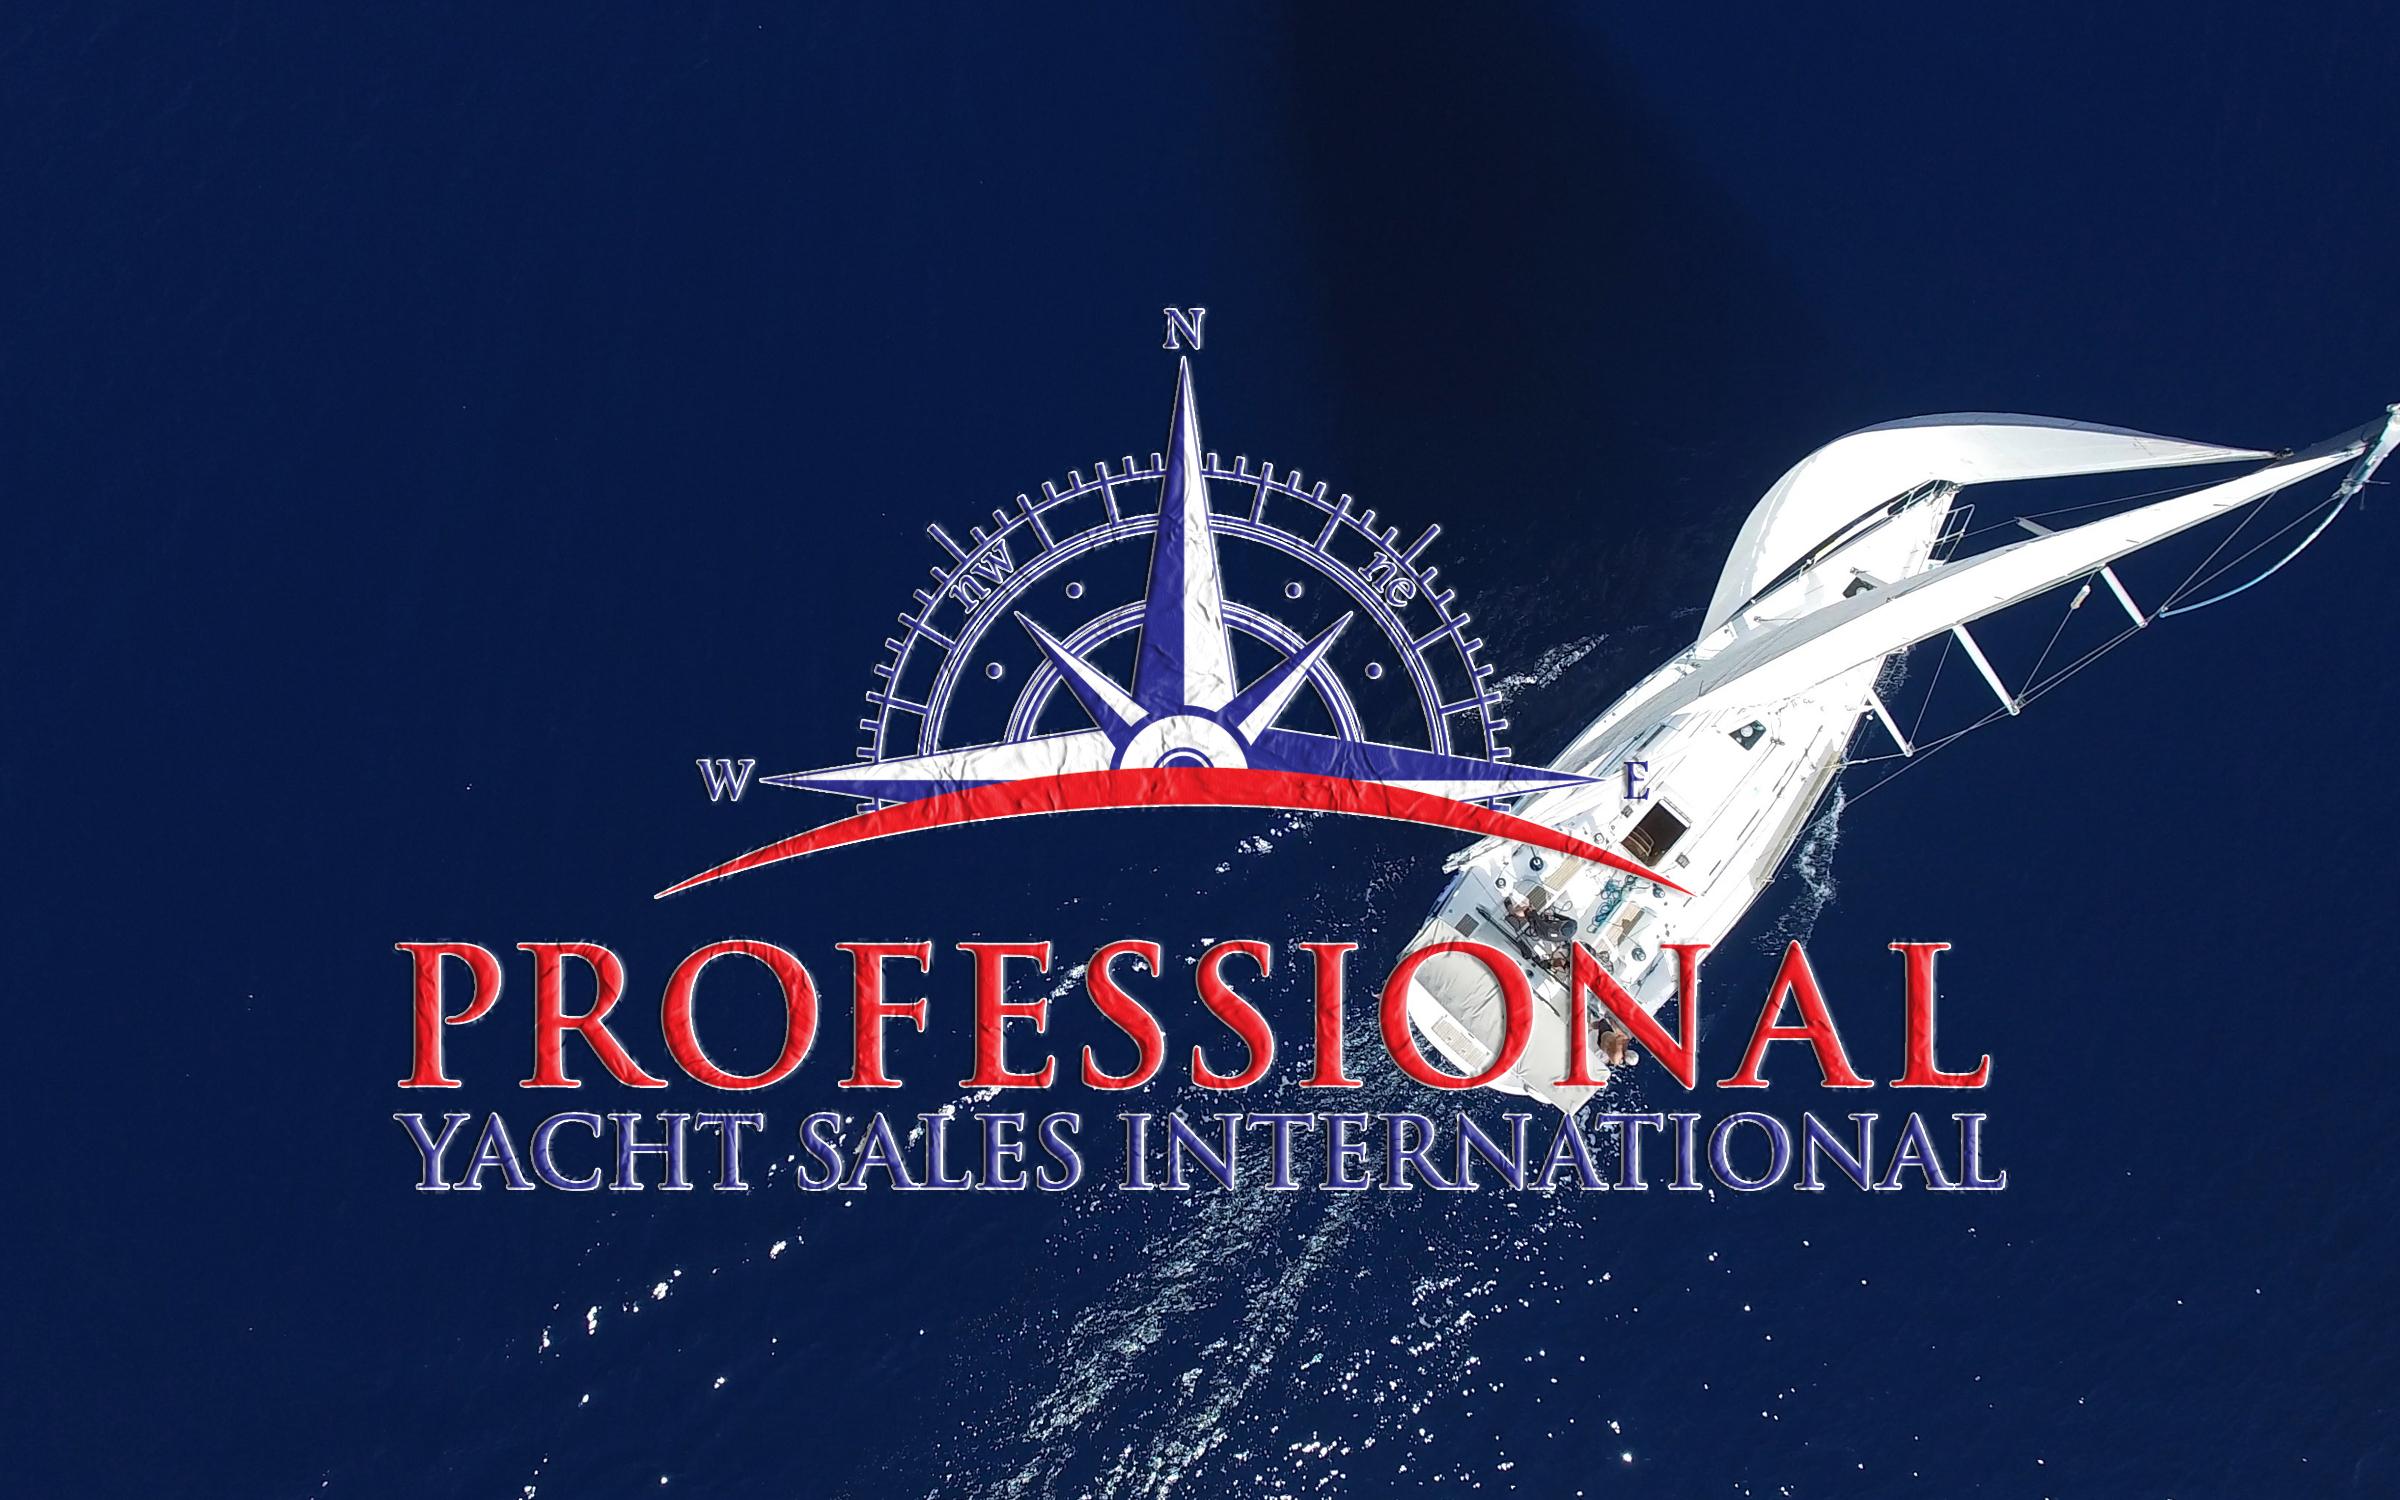 Professional Yacht Sales International